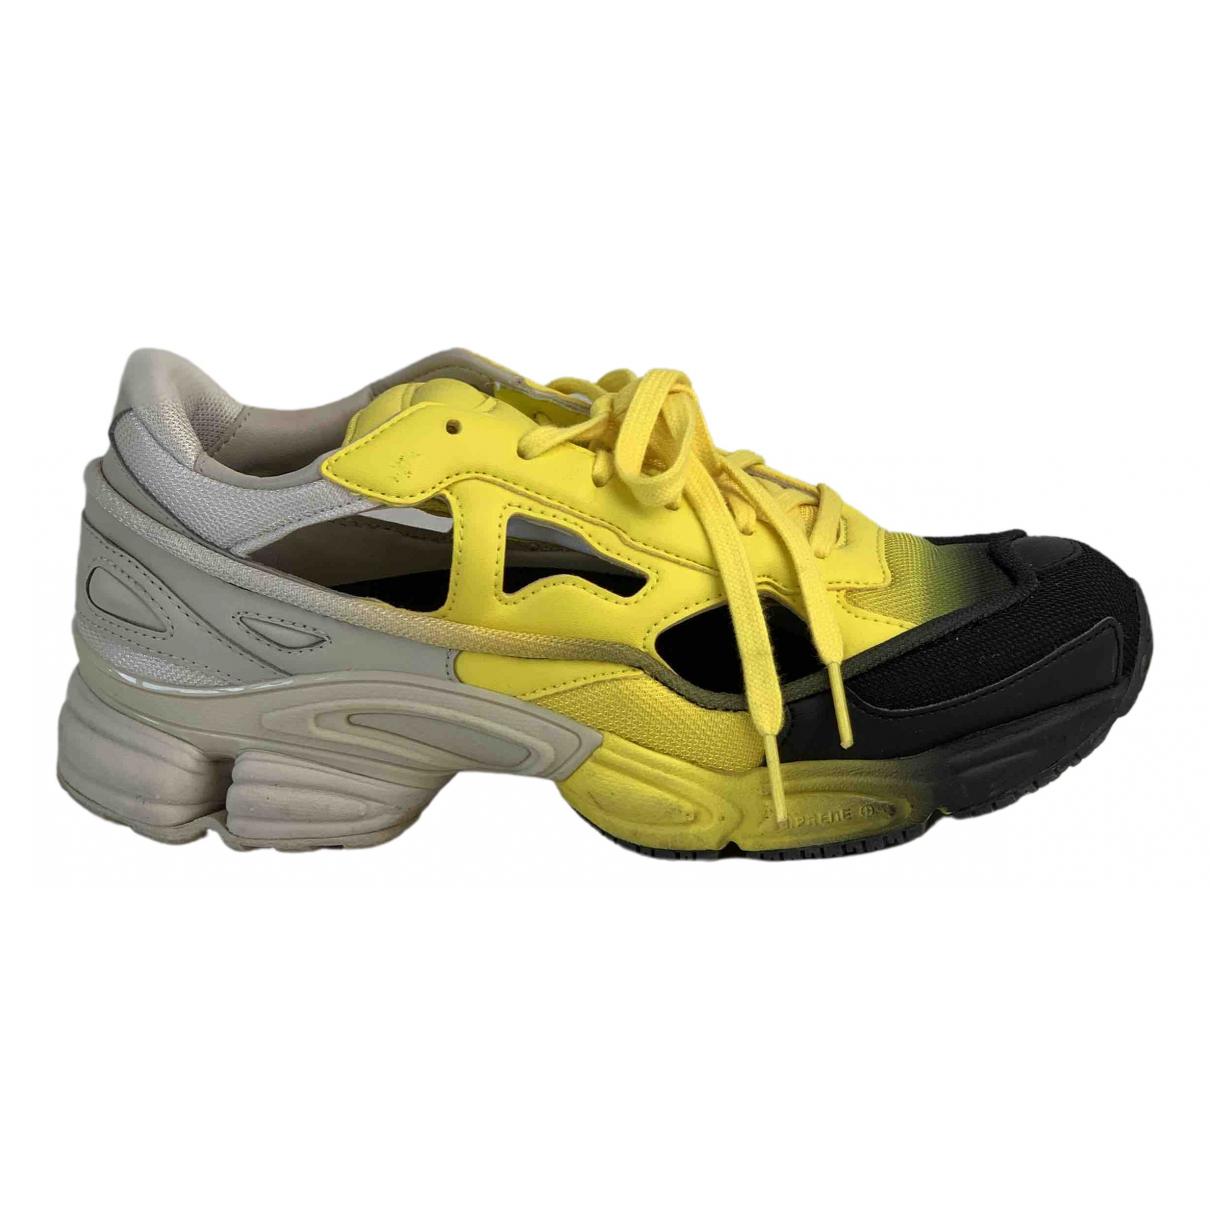 Adidas X Raf Simons Replicant Owzeego Sneakers in  Gelb Polyester